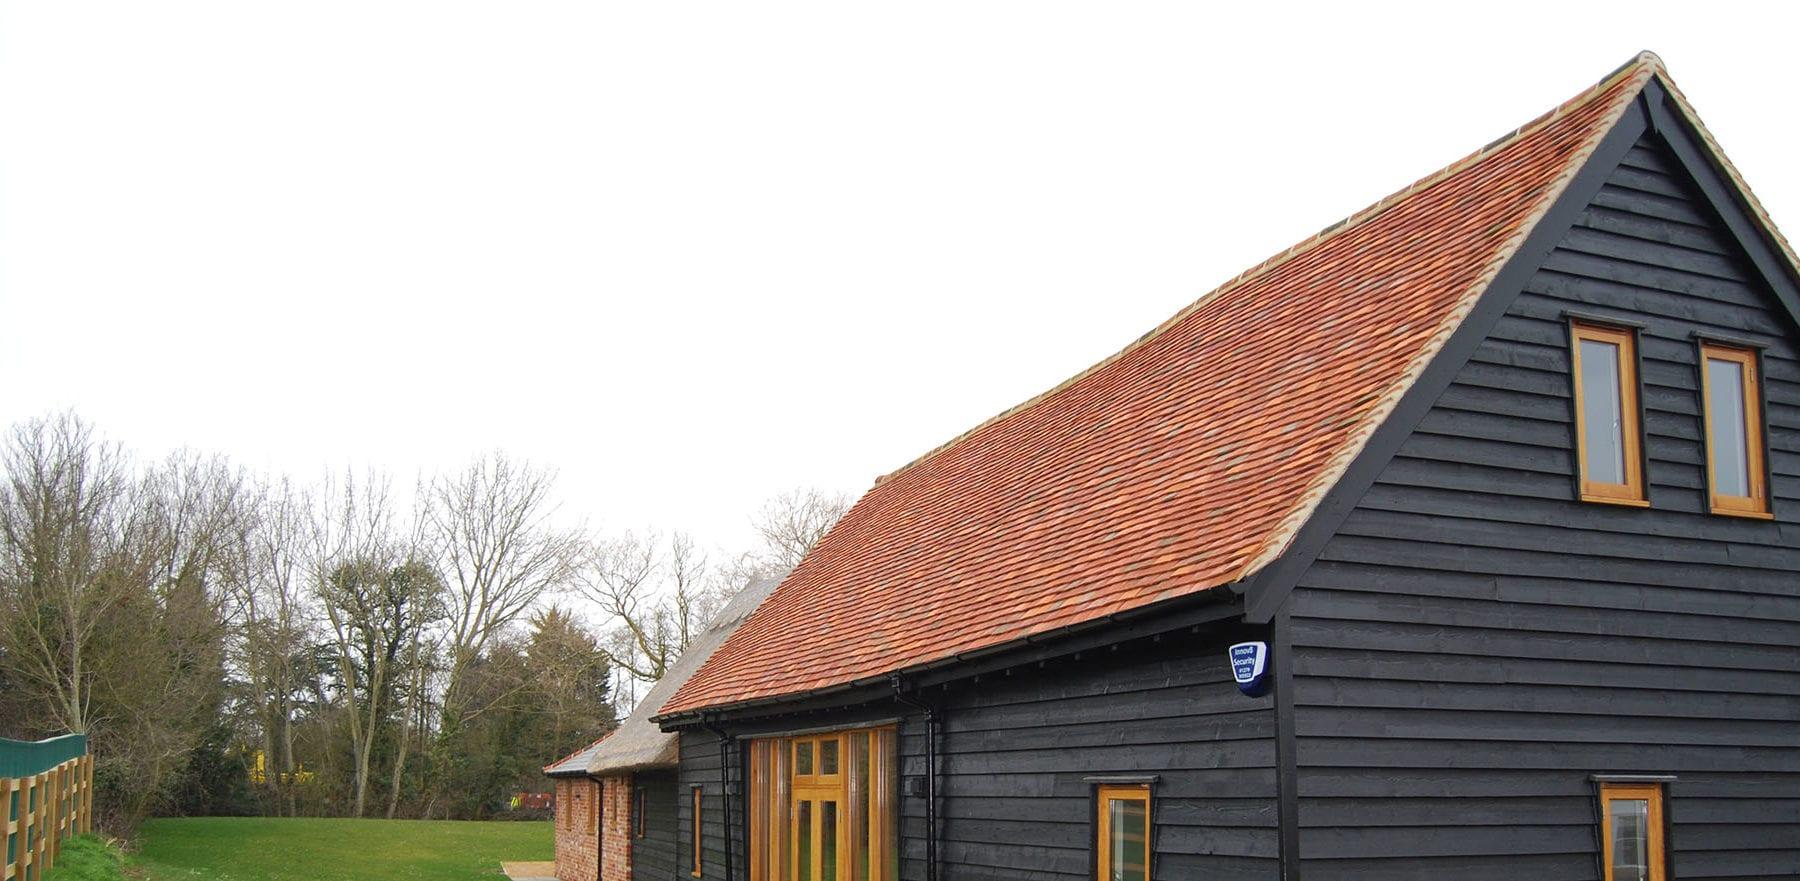 Lifestiles - Handmade Multi Clay Roof Tiles - Ford End, England 6